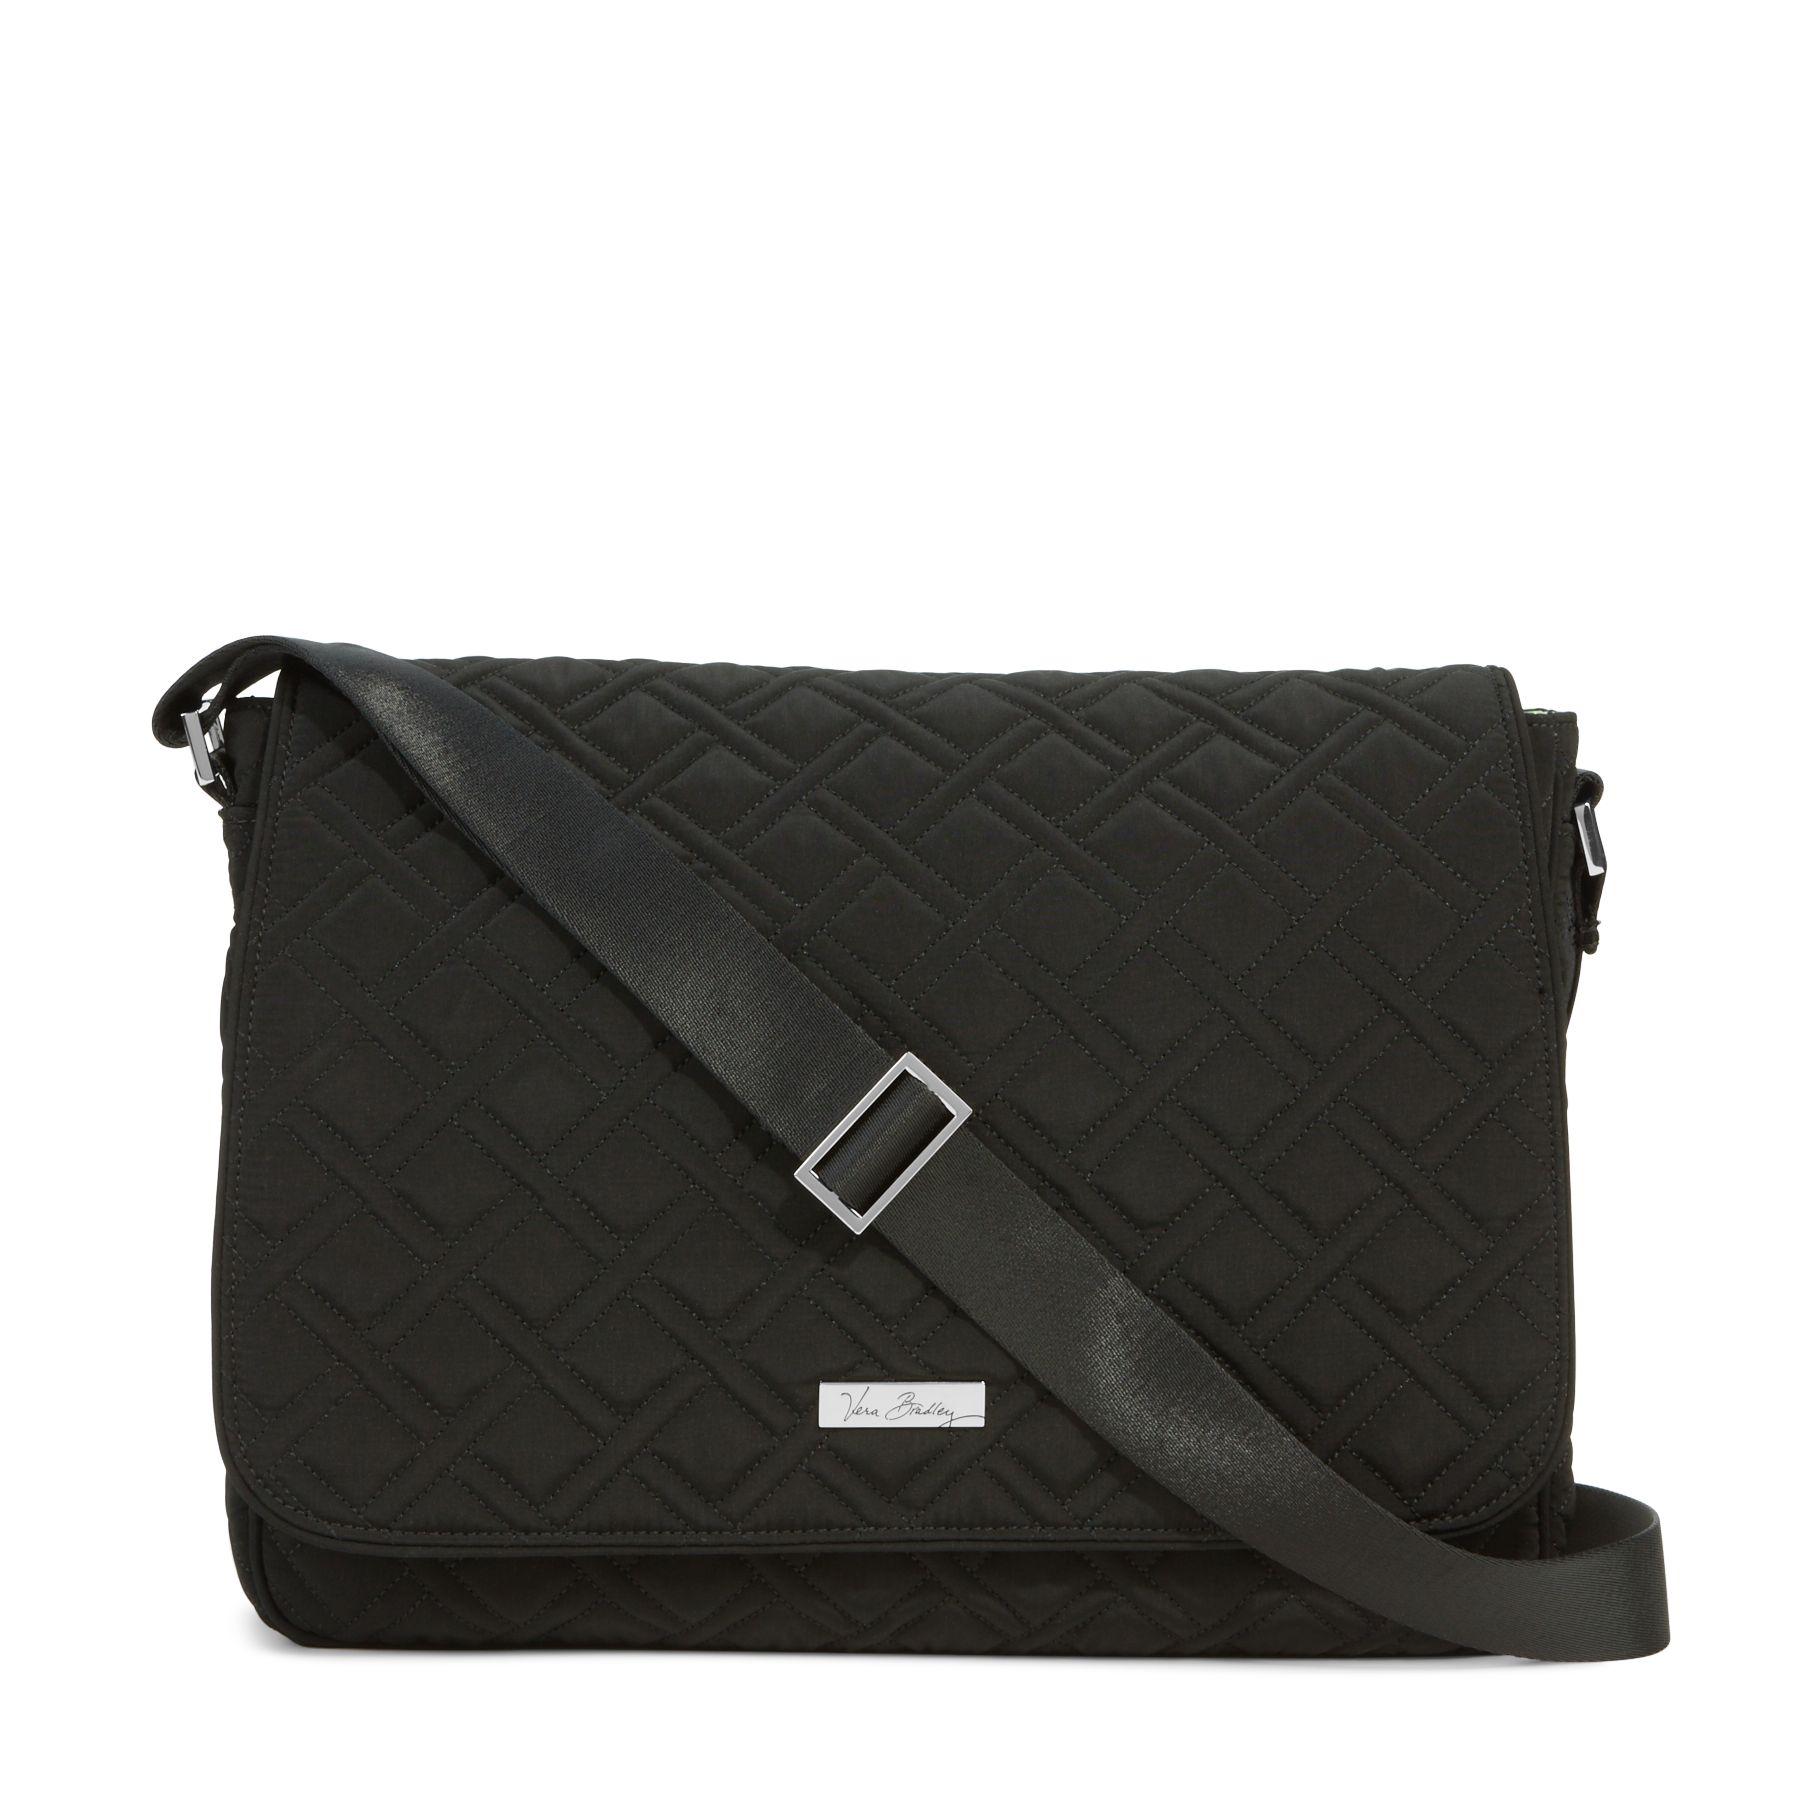 894c7a0fdb50 886003336441. Vera Bradley Laptop Messenger Crossbody Bag in Classic Black.  EAN-13 Barcode ...